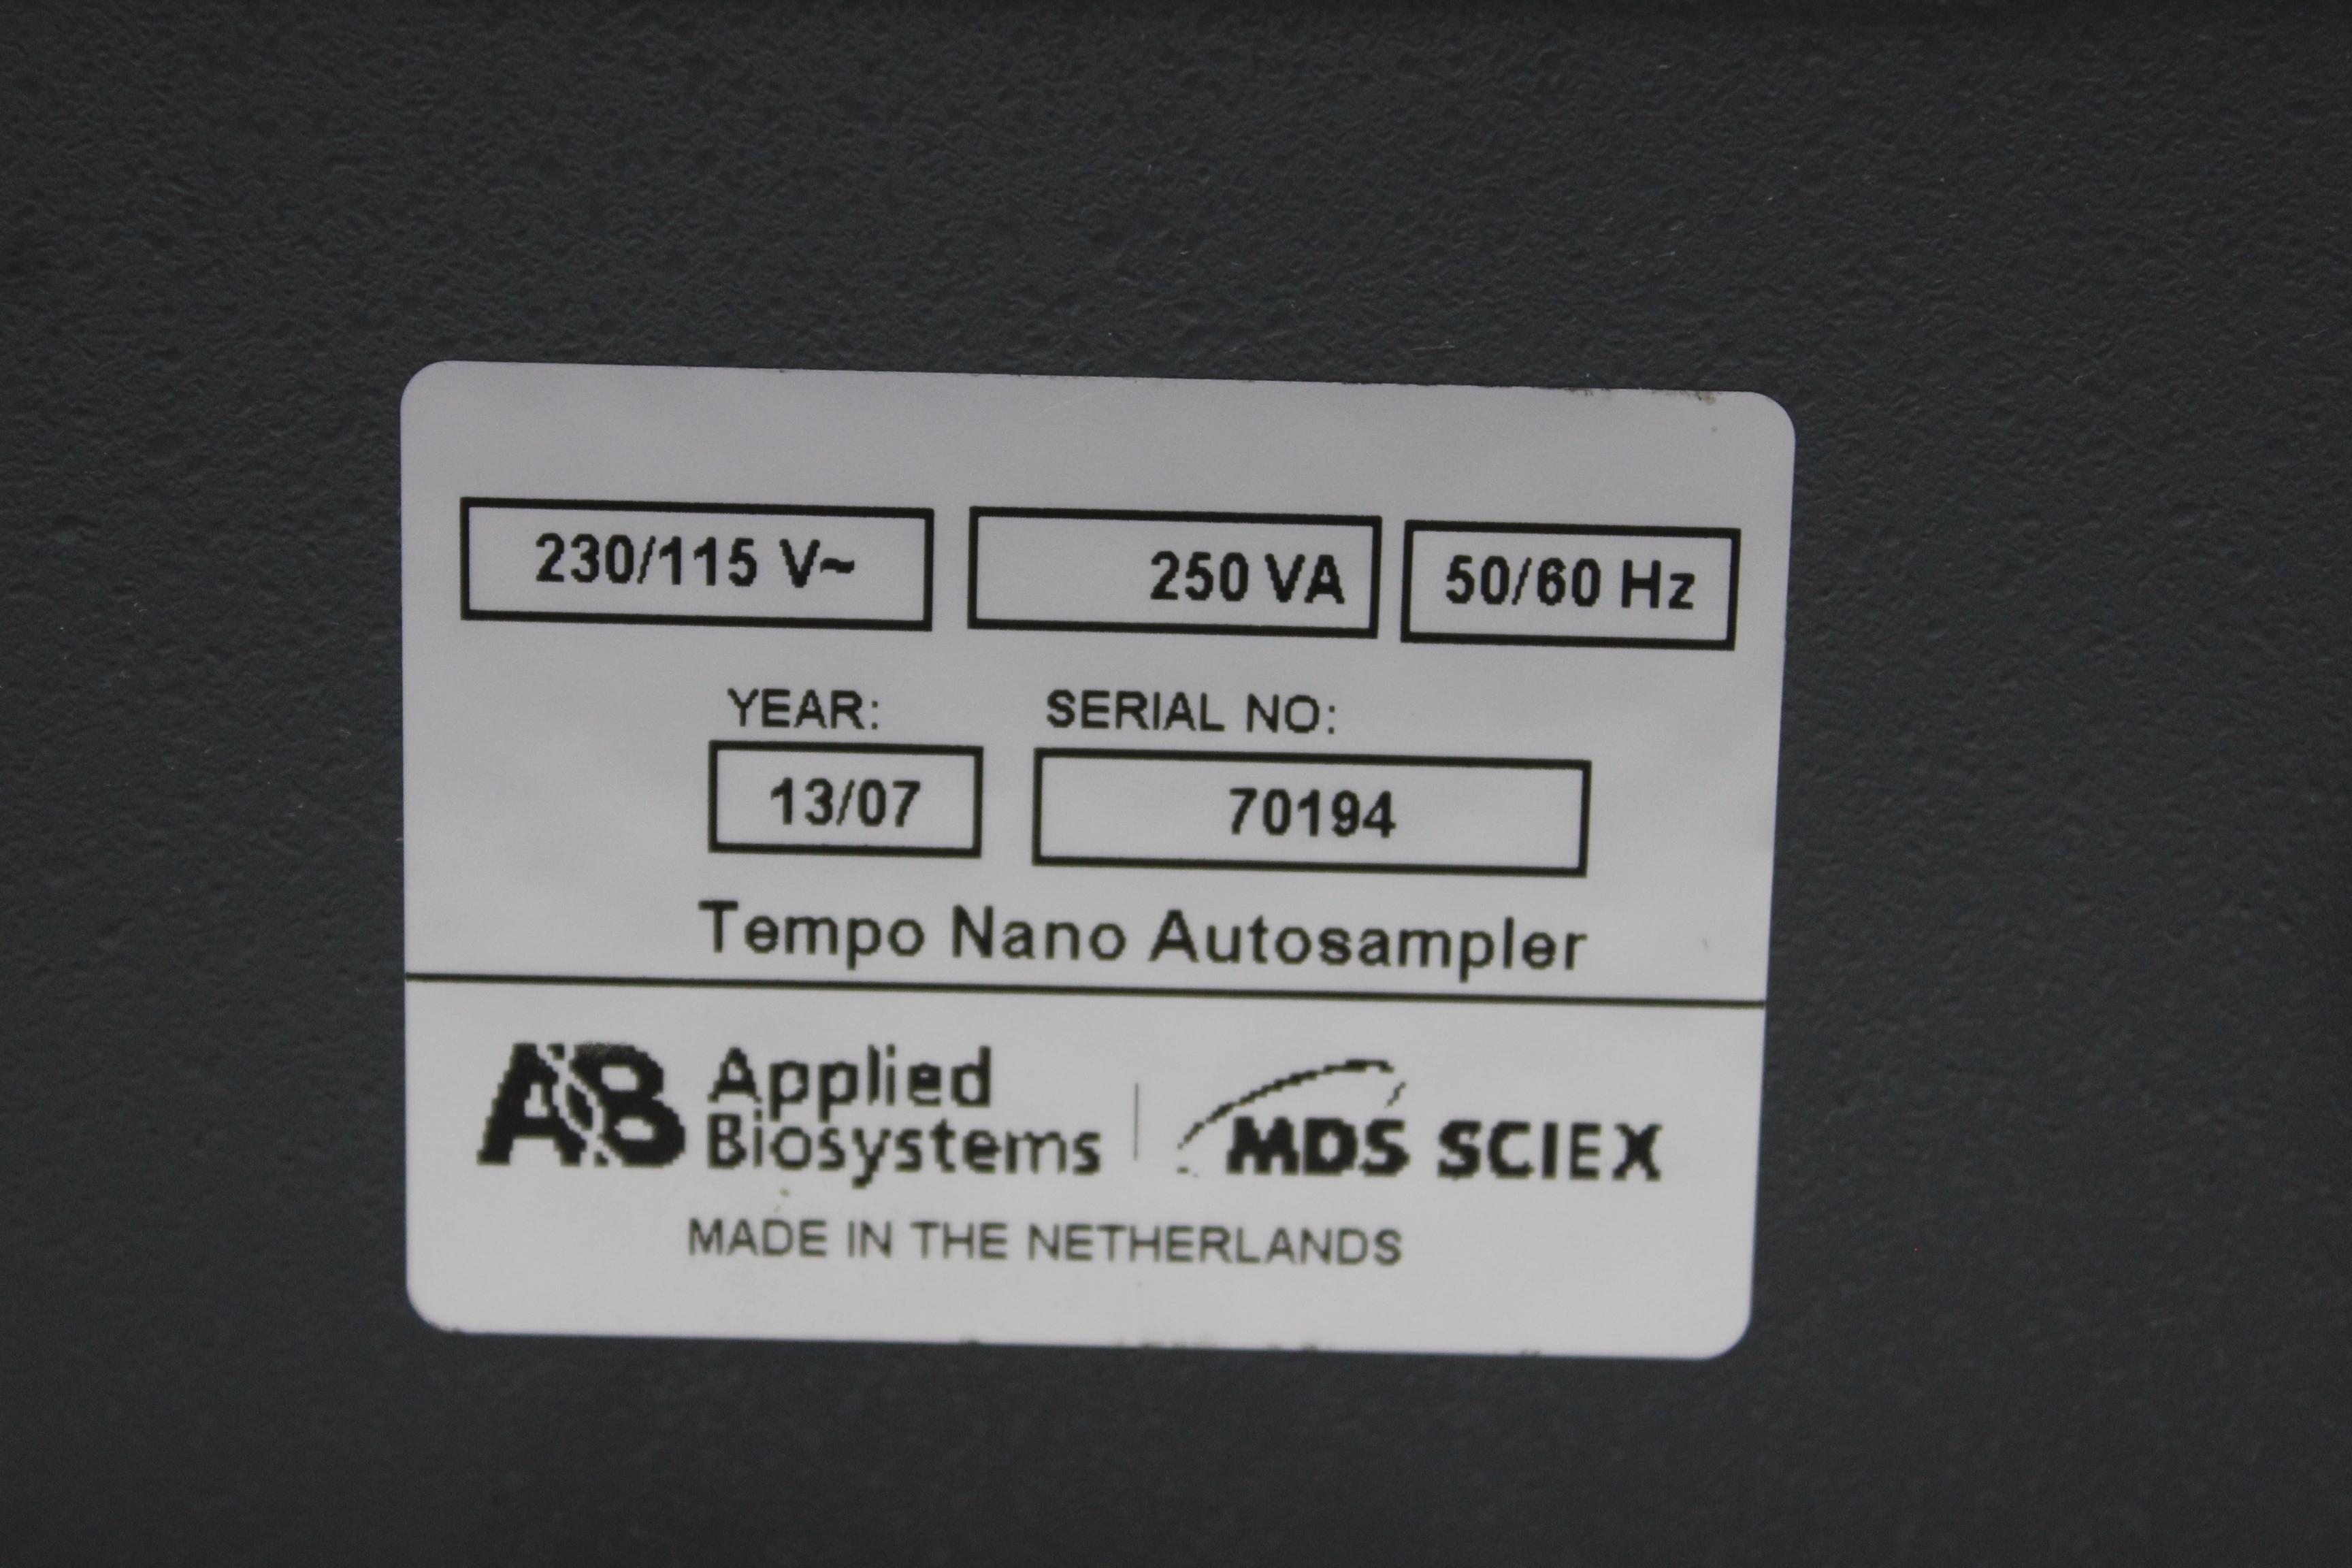 Image APPLIED BIOSYSTEMS MDS SCIEX Tempo Nano Autosampler 1587233